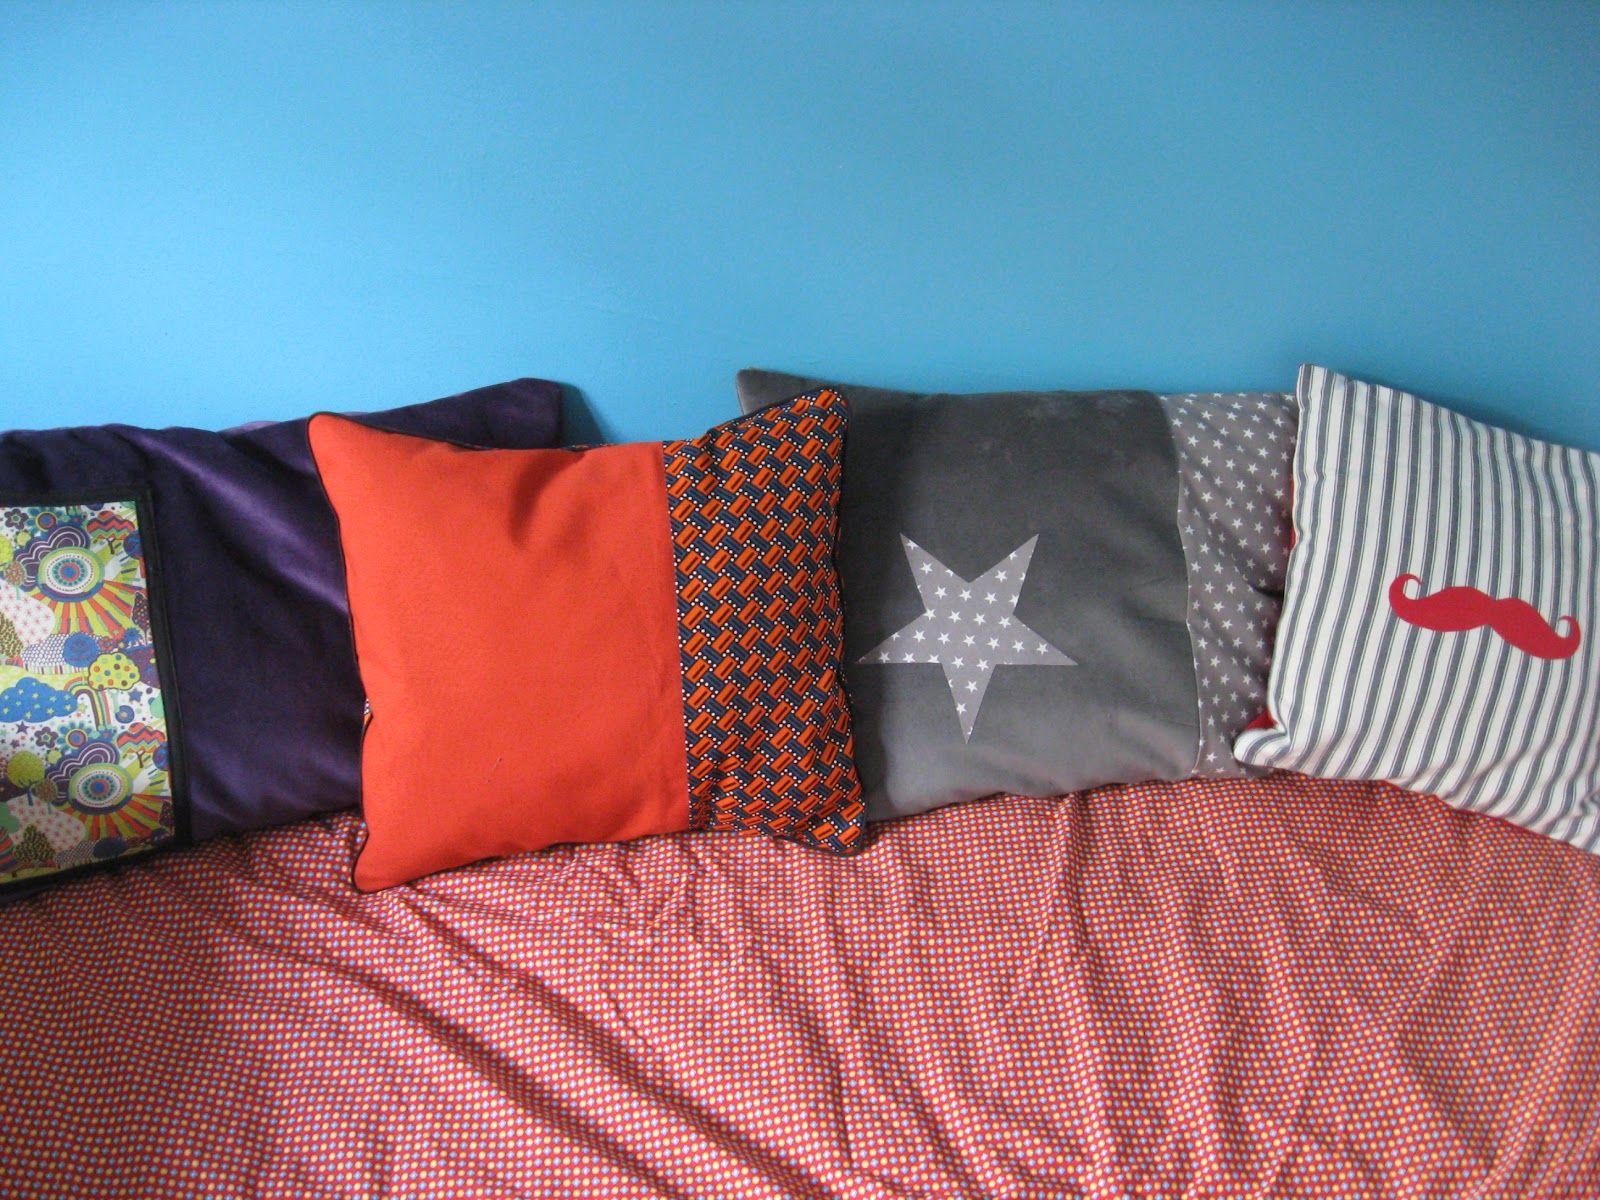 francine et rosalie le coussin ethnique chic. Black Bedroom Furniture Sets. Home Design Ideas